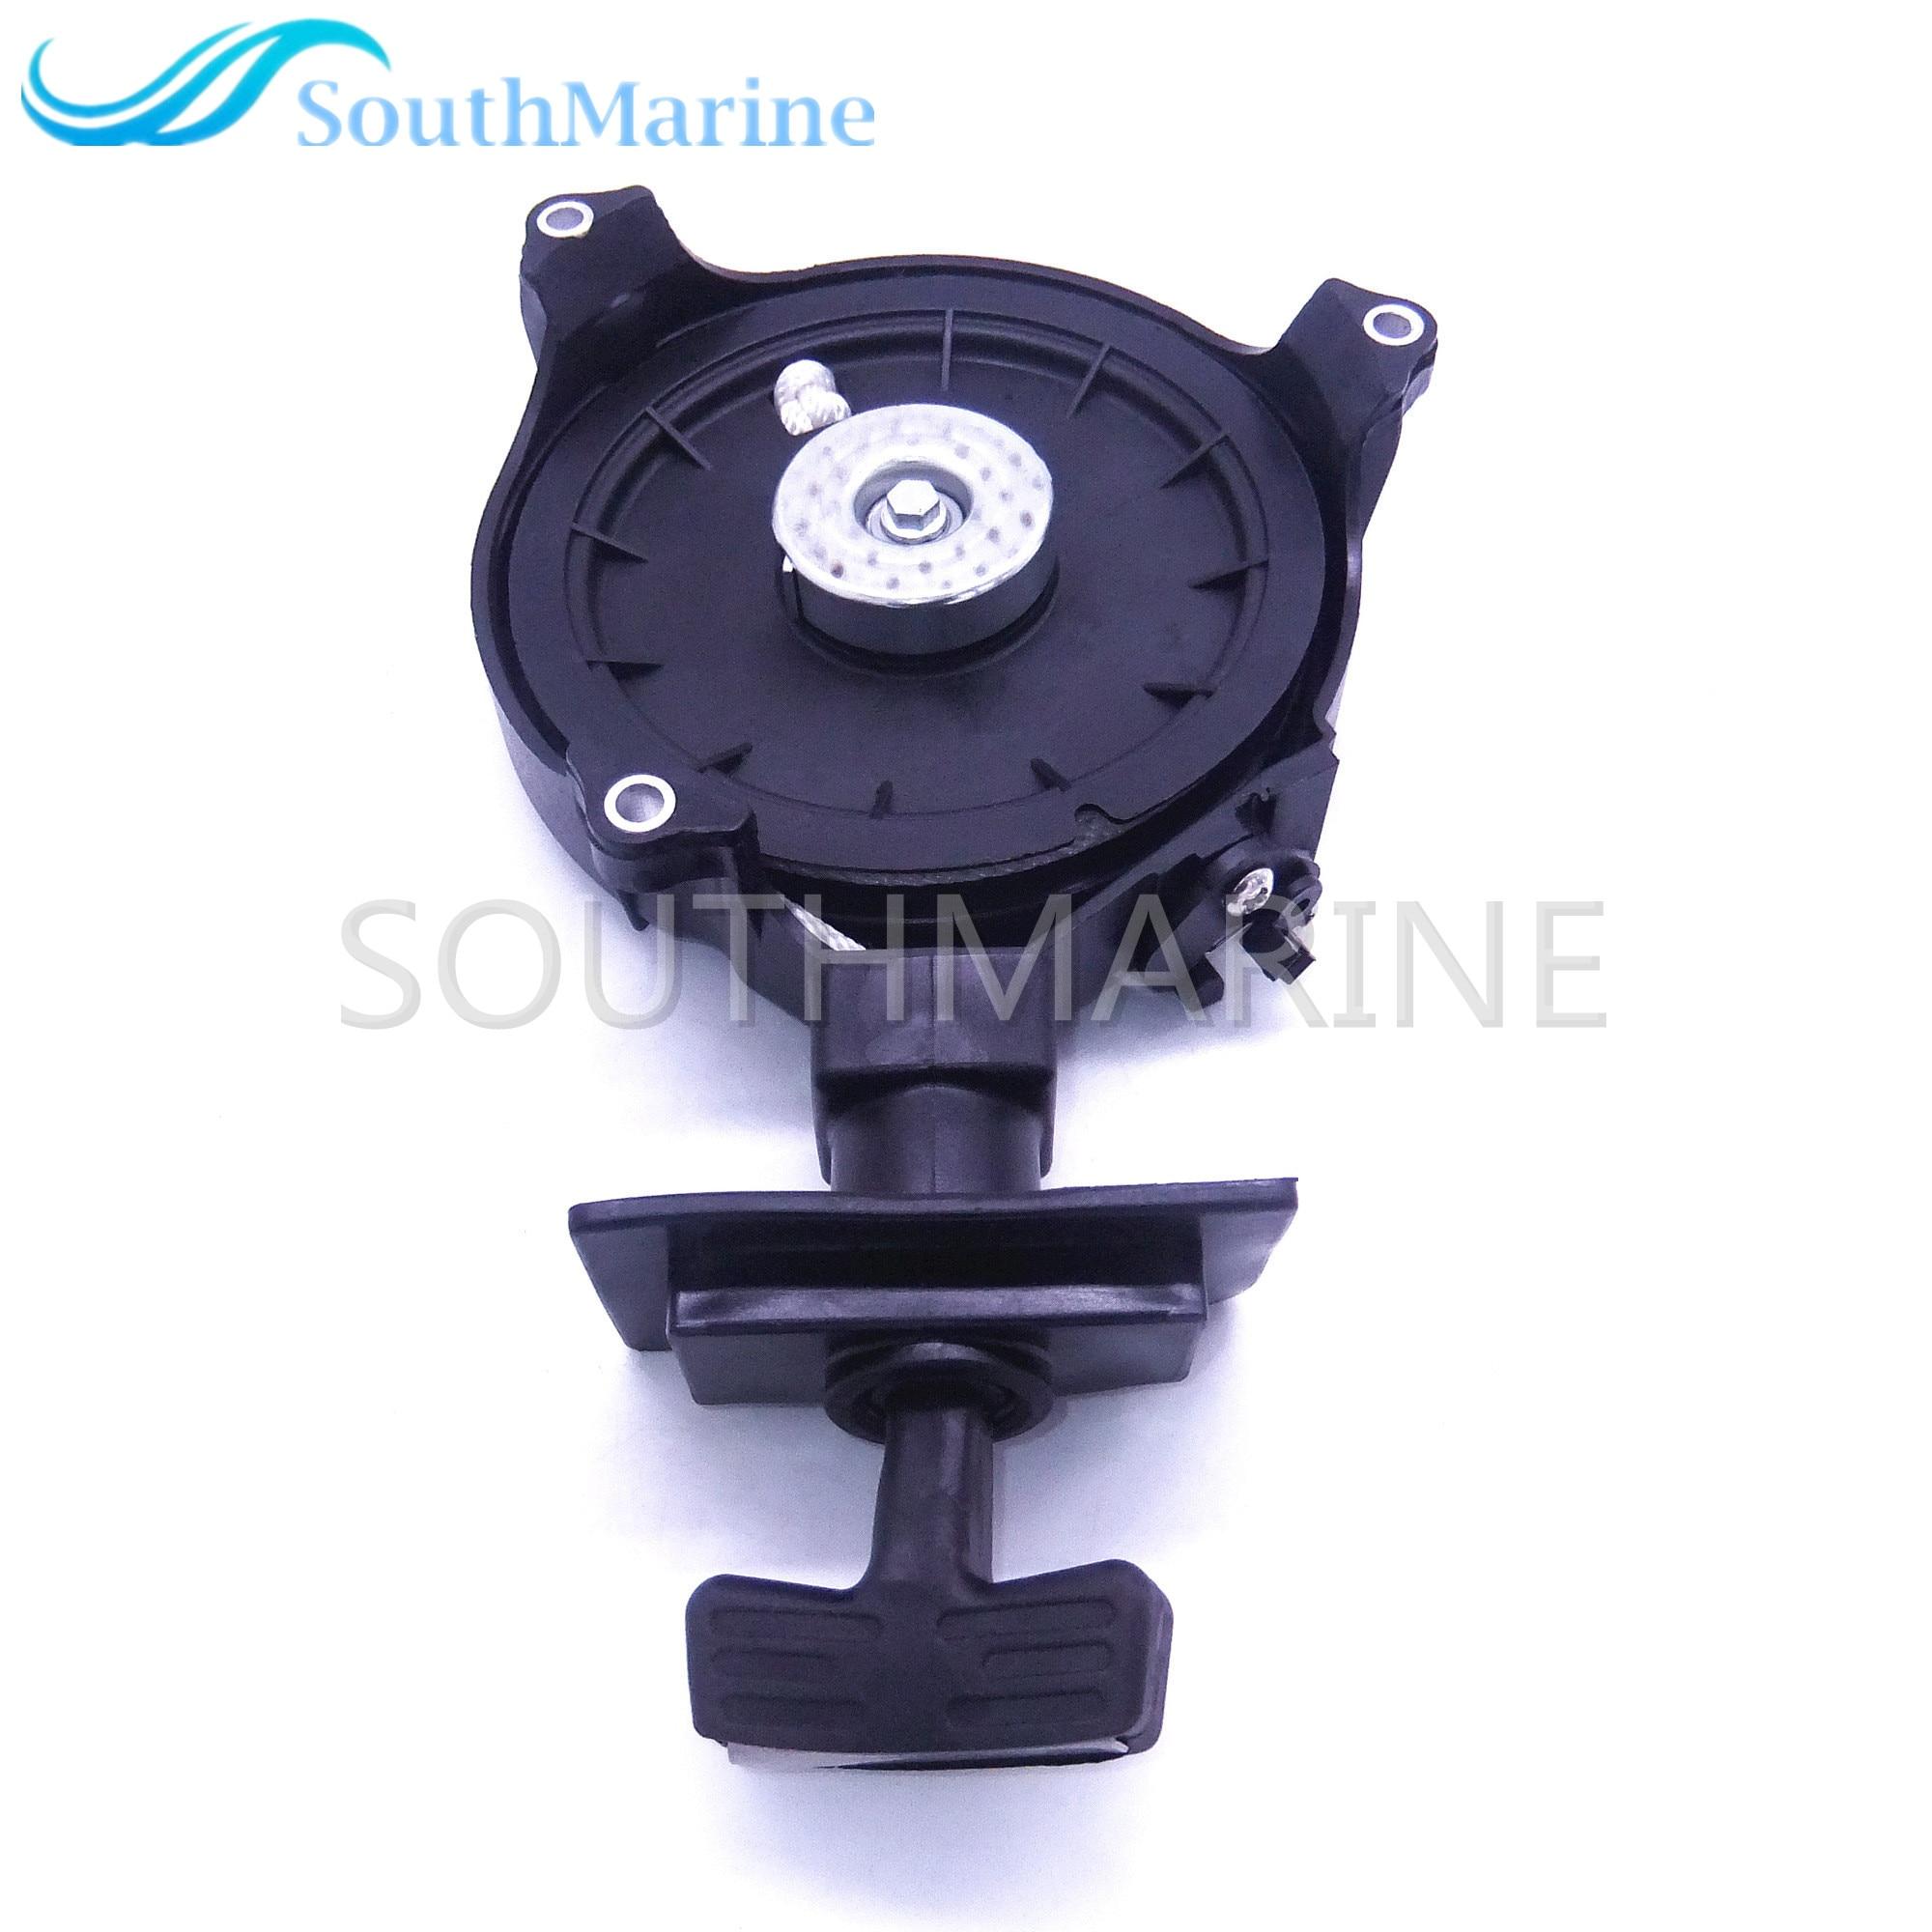 Outboard Motor Pull Starter Assy For Hangkai 2-stroke 5hp 6hp Boat